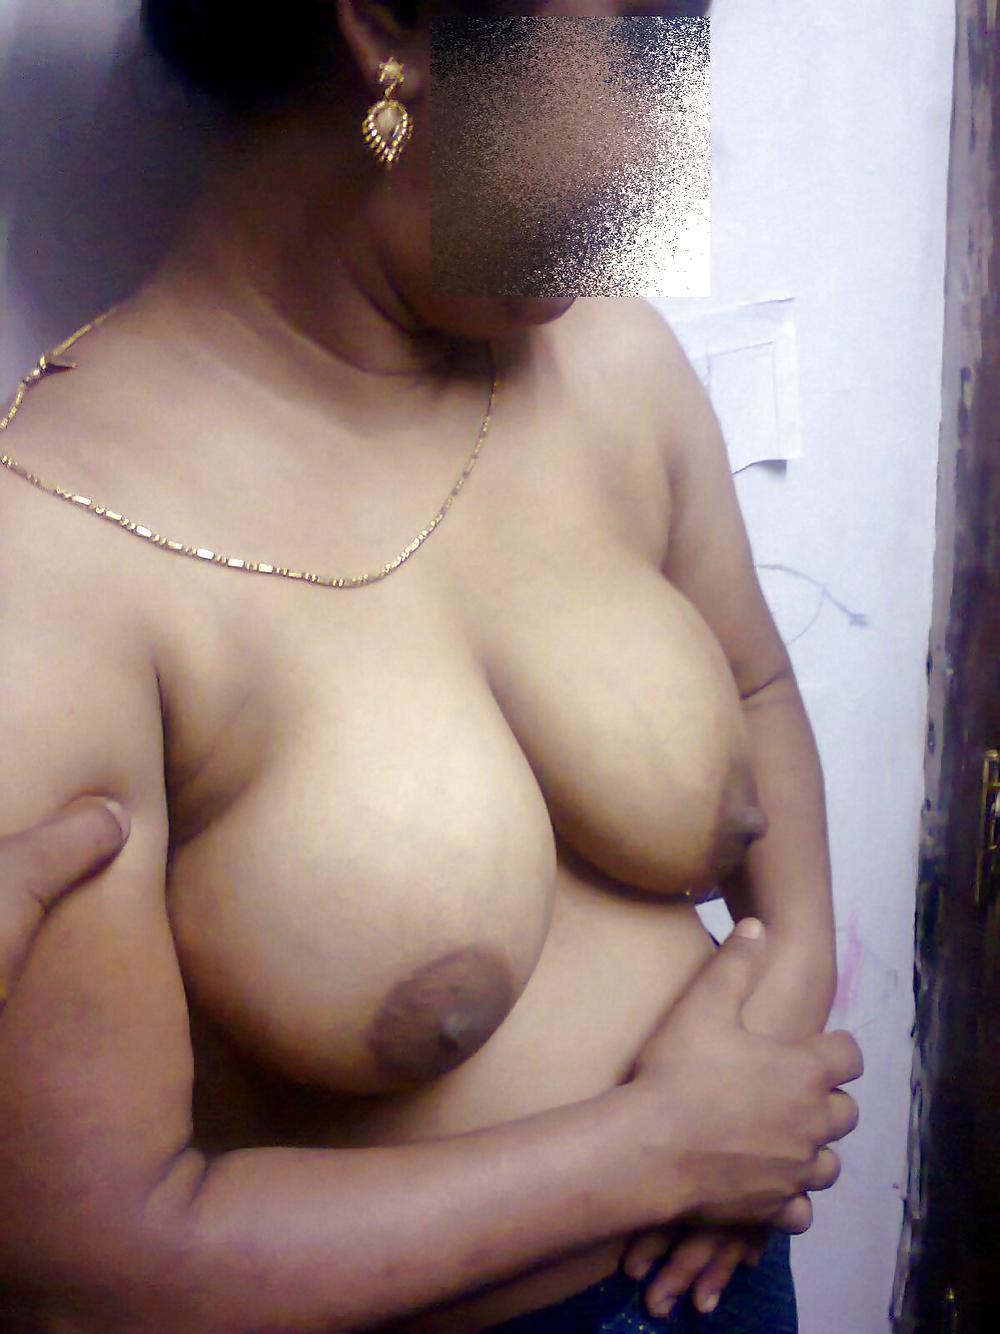 Xnxx Big Boobs Desi Bhabhi Xxx Homemade Hindi Sex Photo